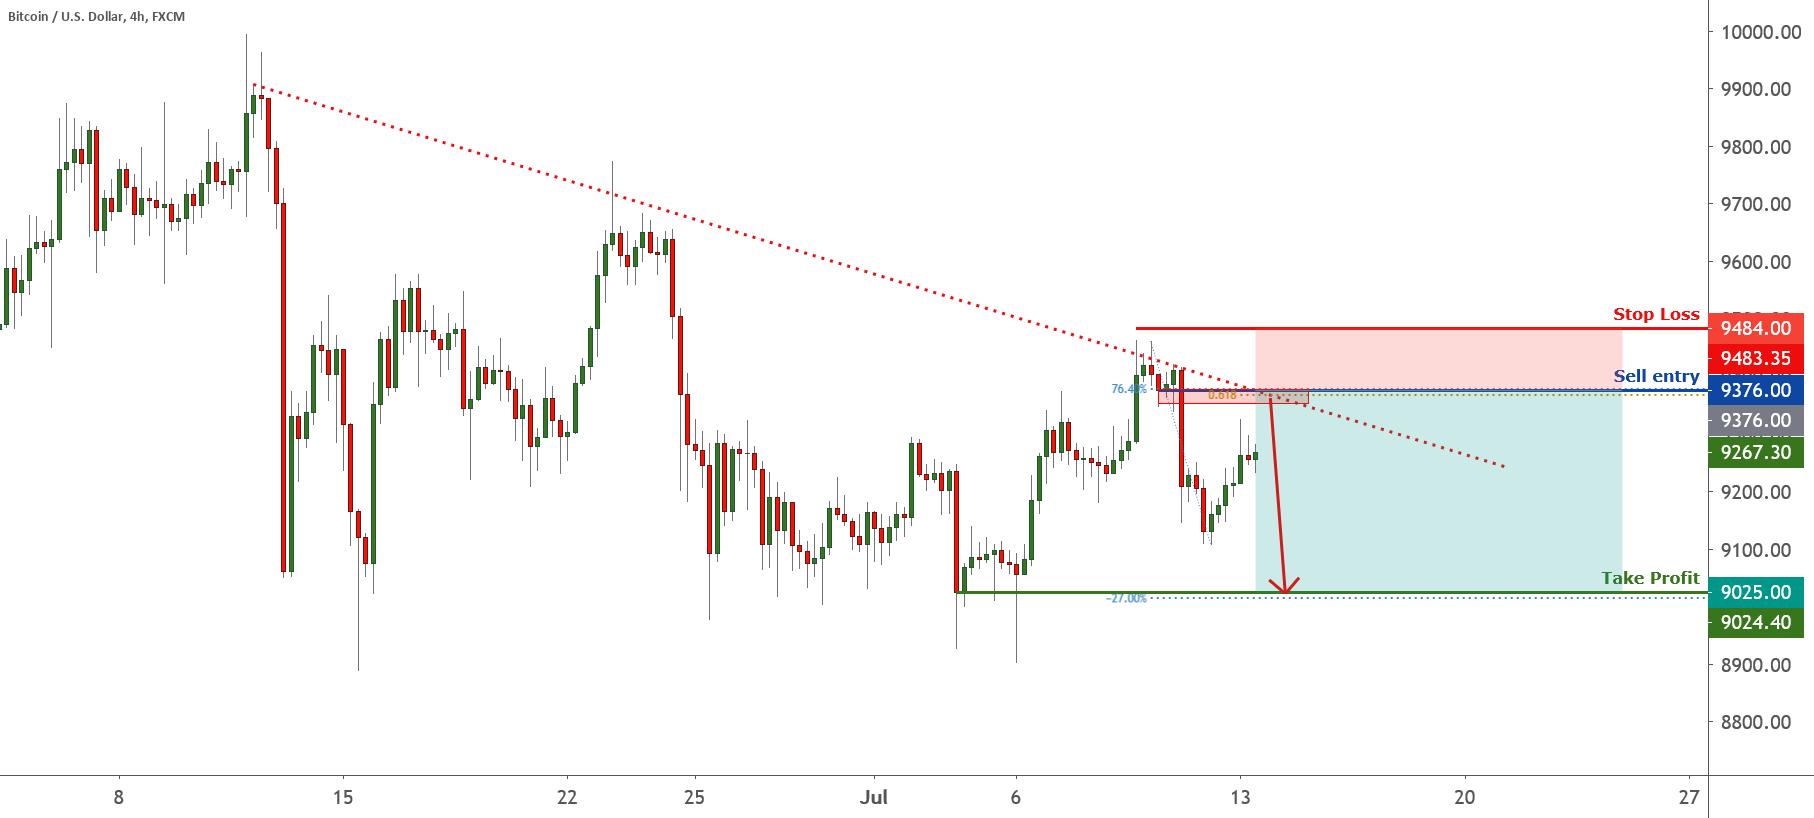 BTC holding below descending trendline! | 13th July 2020 for FX:BTCUSD by FXCM